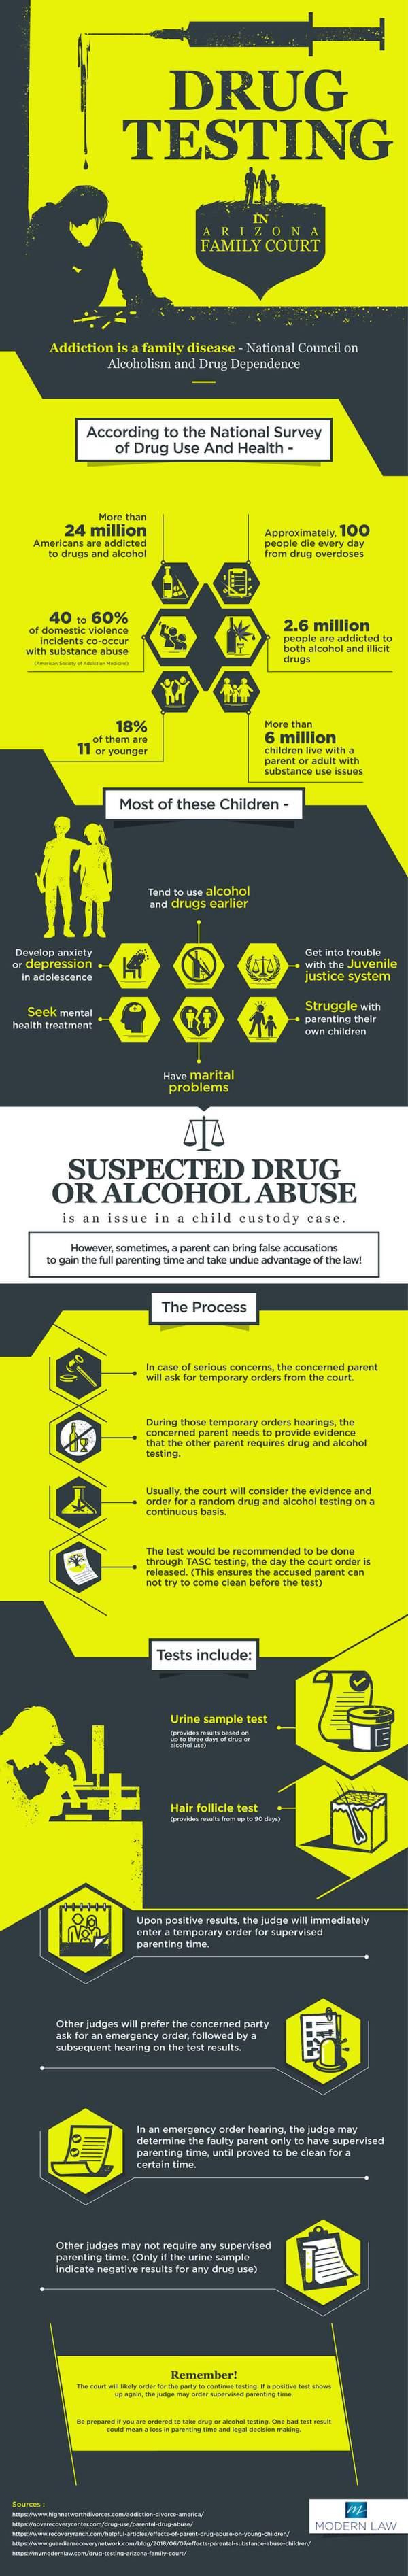 DRUG-TESTING-IN-ARIZONA_small